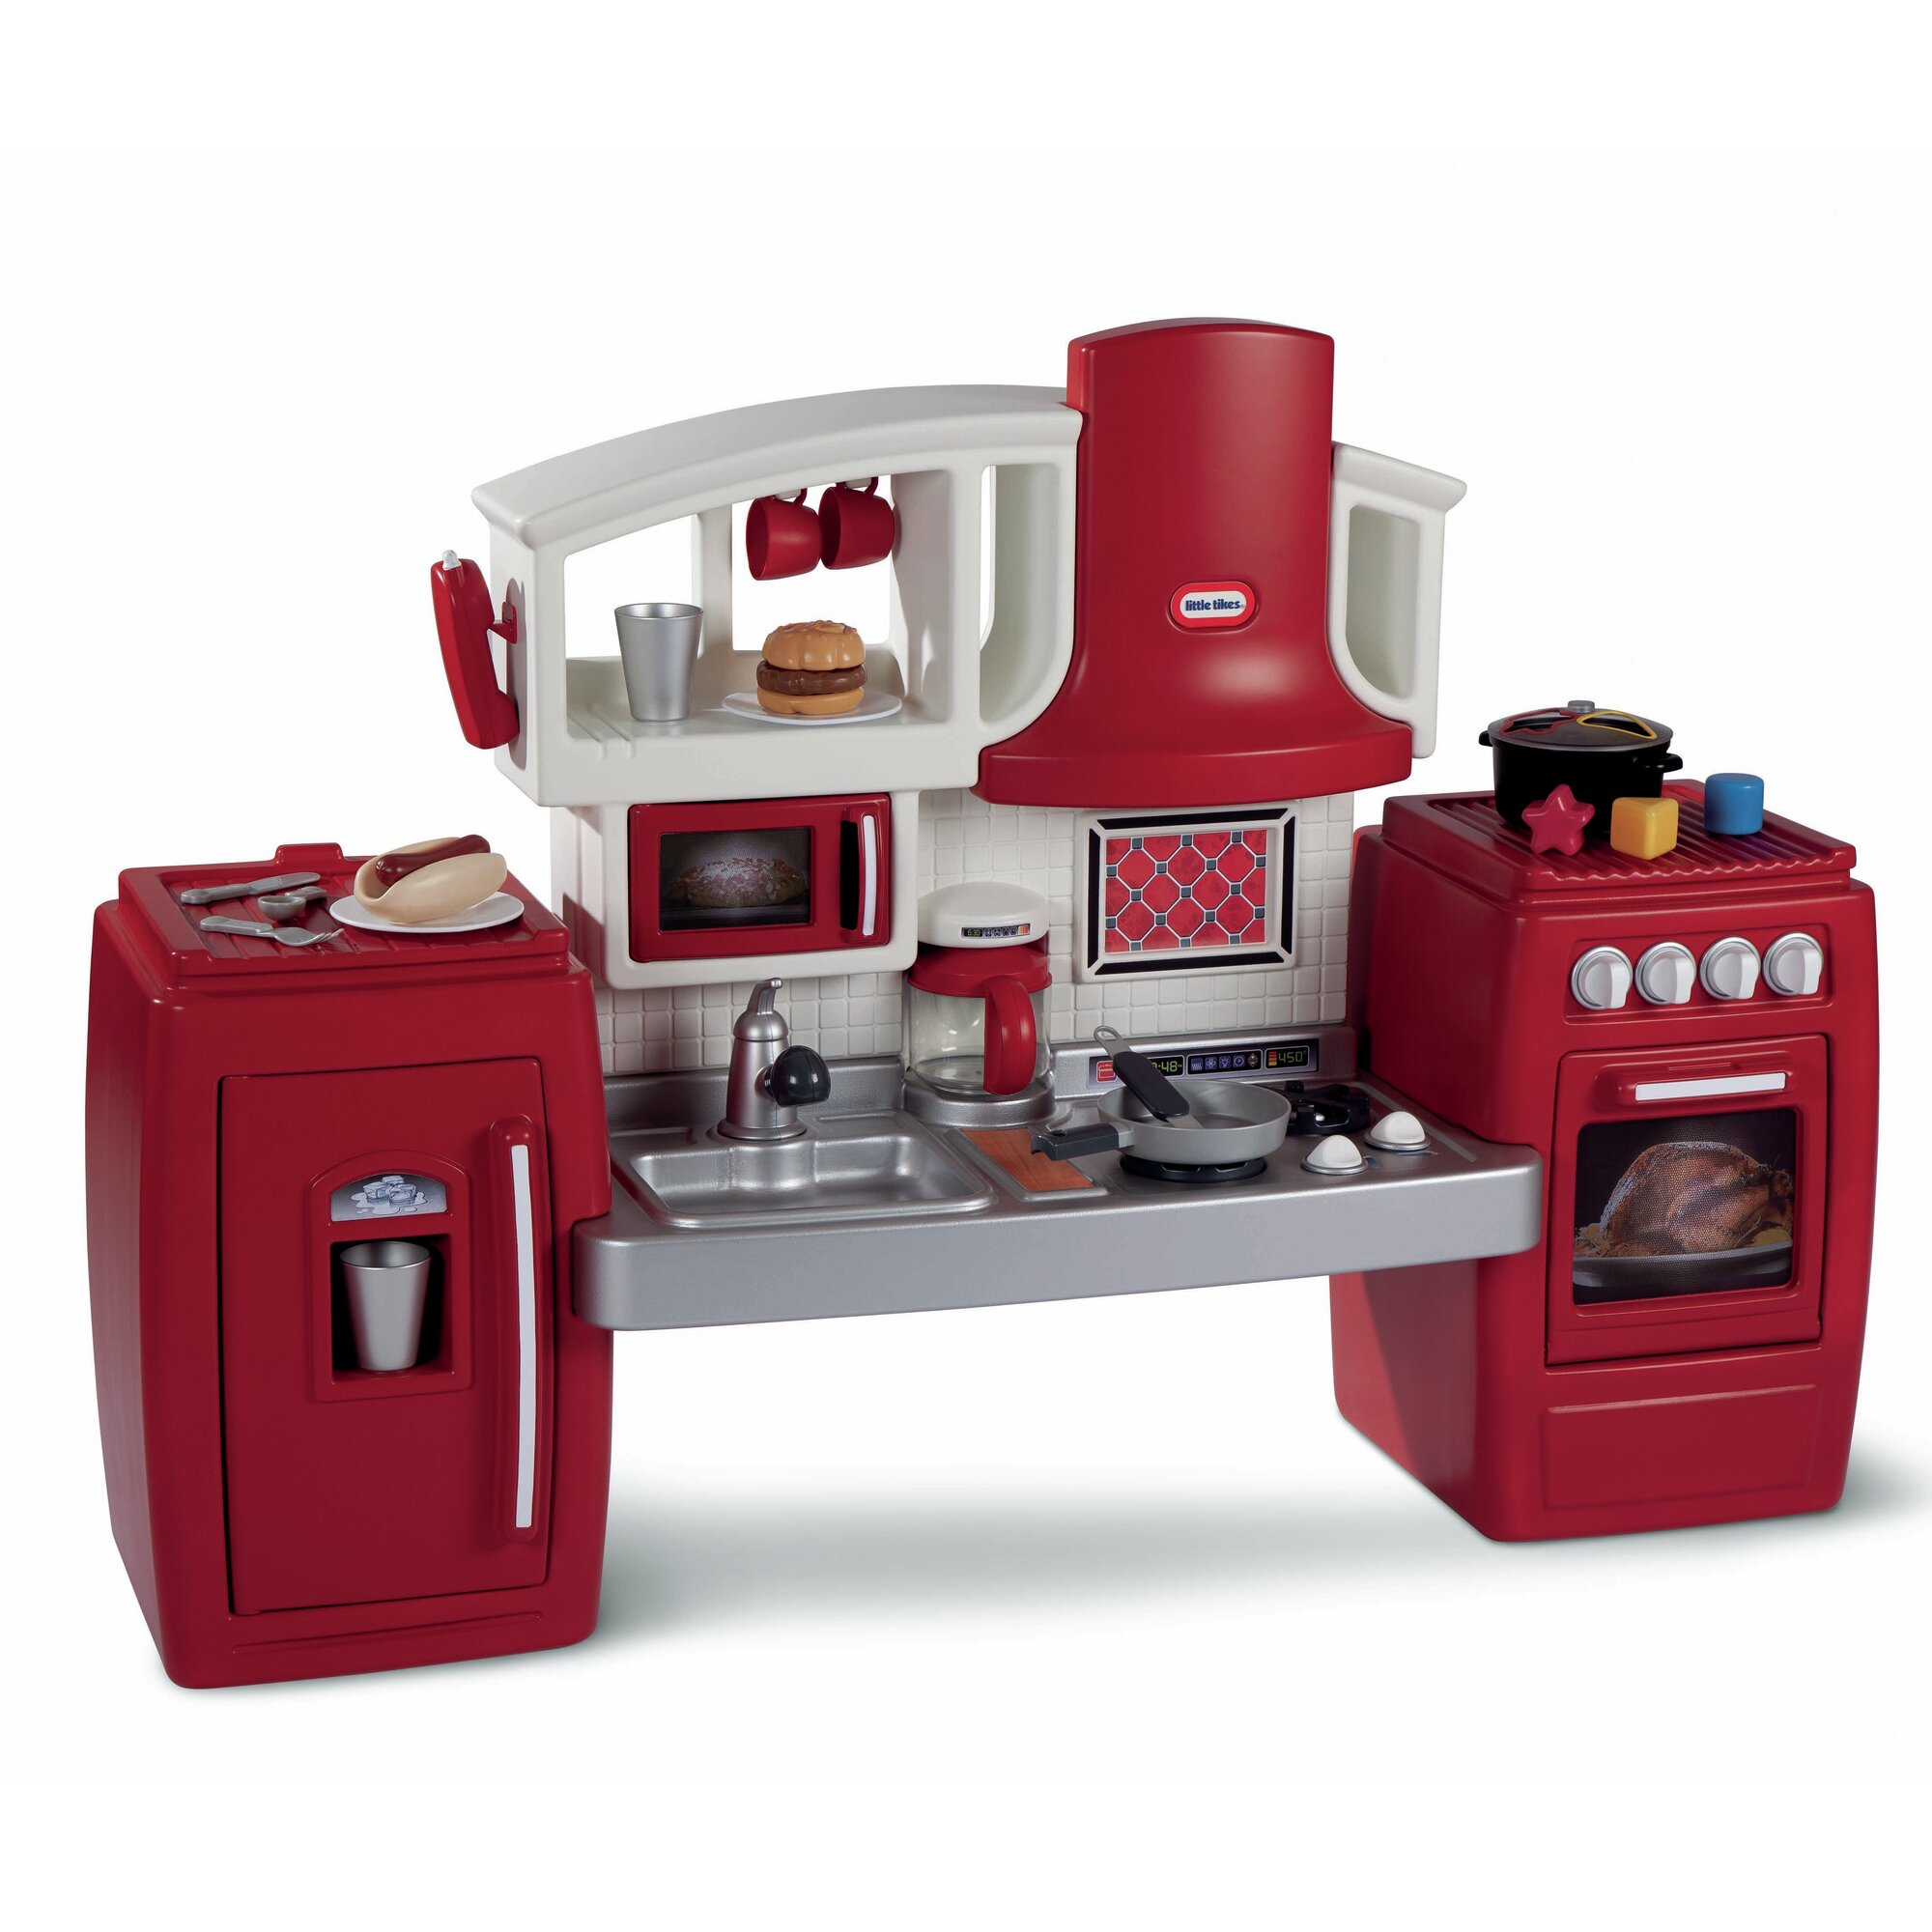 Little Tikes Kitchen Set: Little Tikes Cook 'n Grow Kitchen Set & Reviews